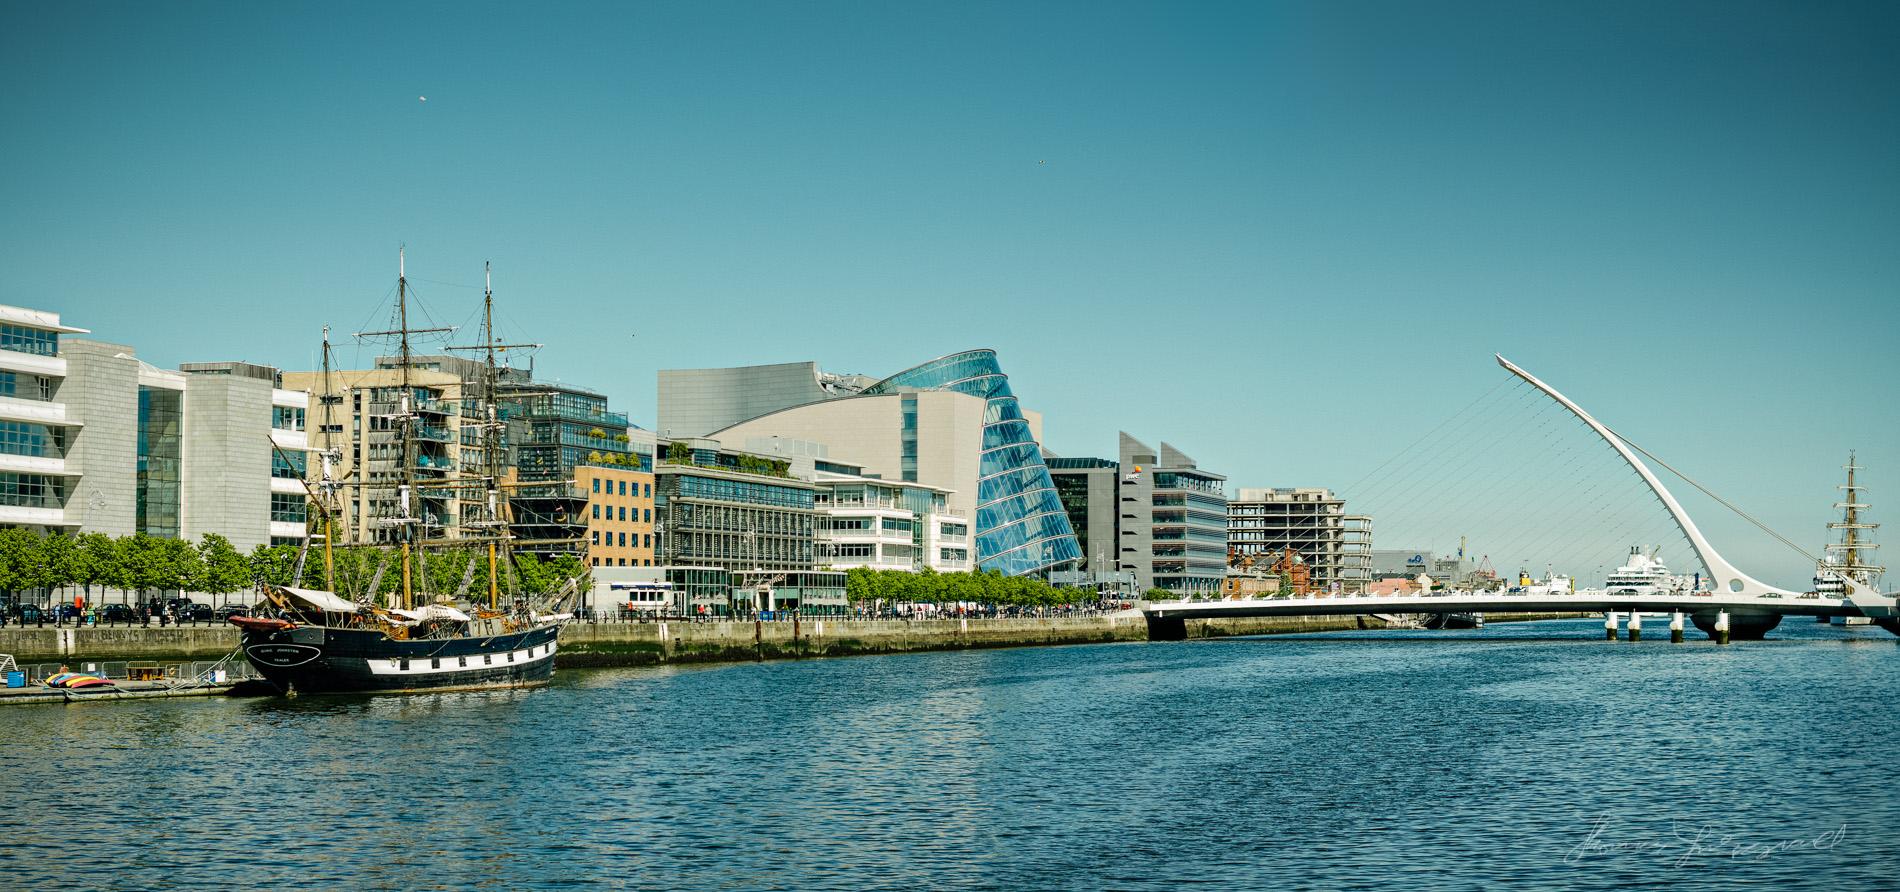 Dublin Docklands Skyline Panorama